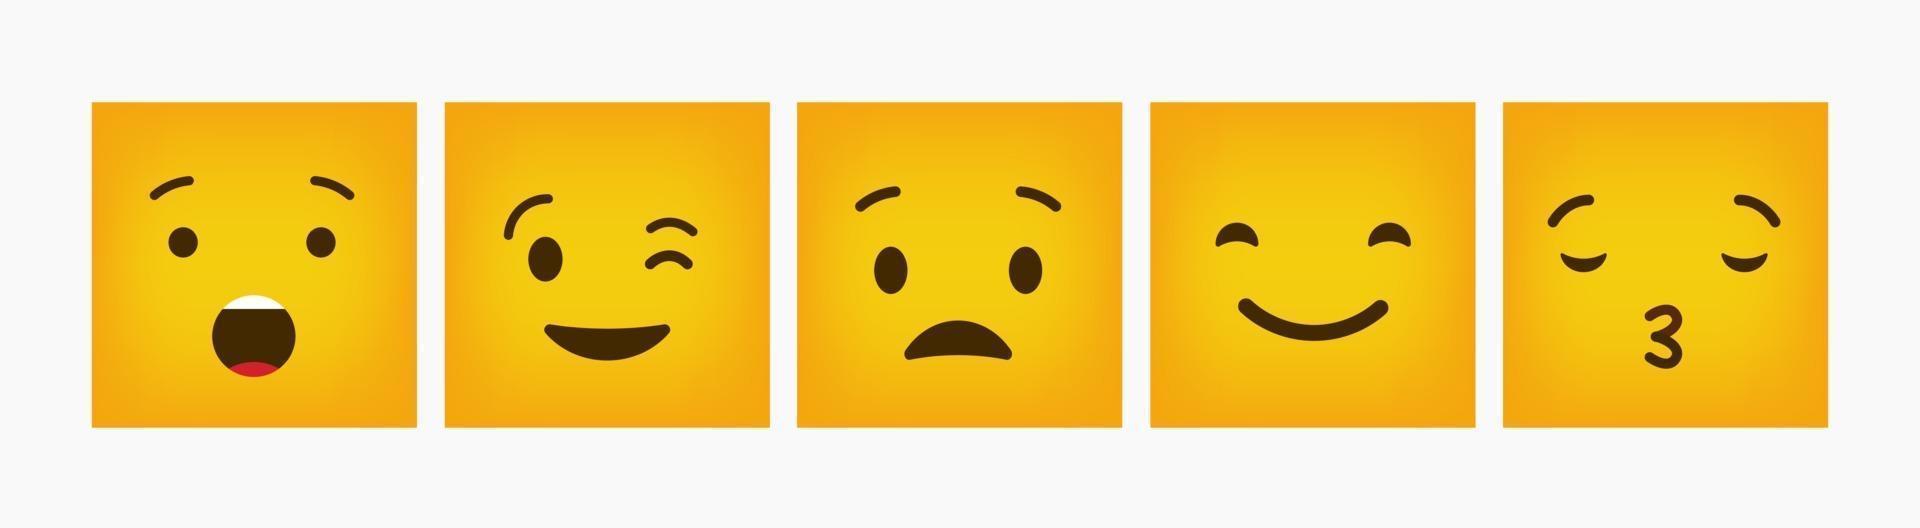 Emoticon Reaktions Design Flat Square Set vektor